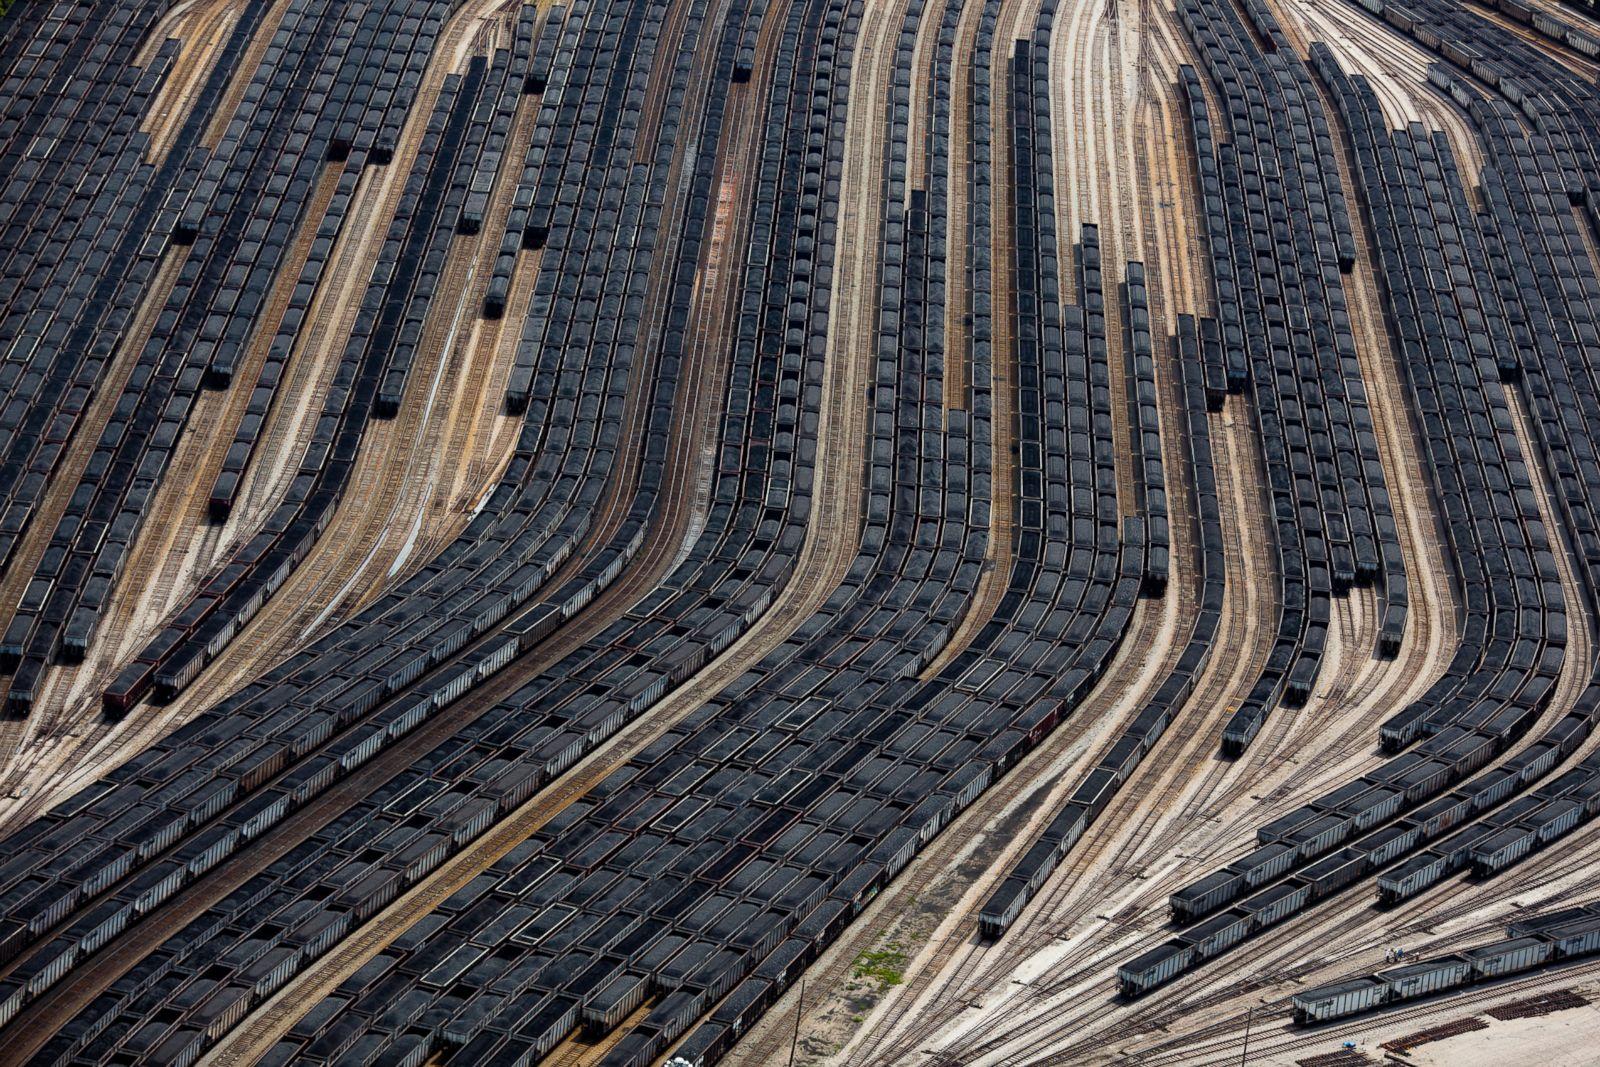 Loaded coal train cars in Norfolk, Virginia